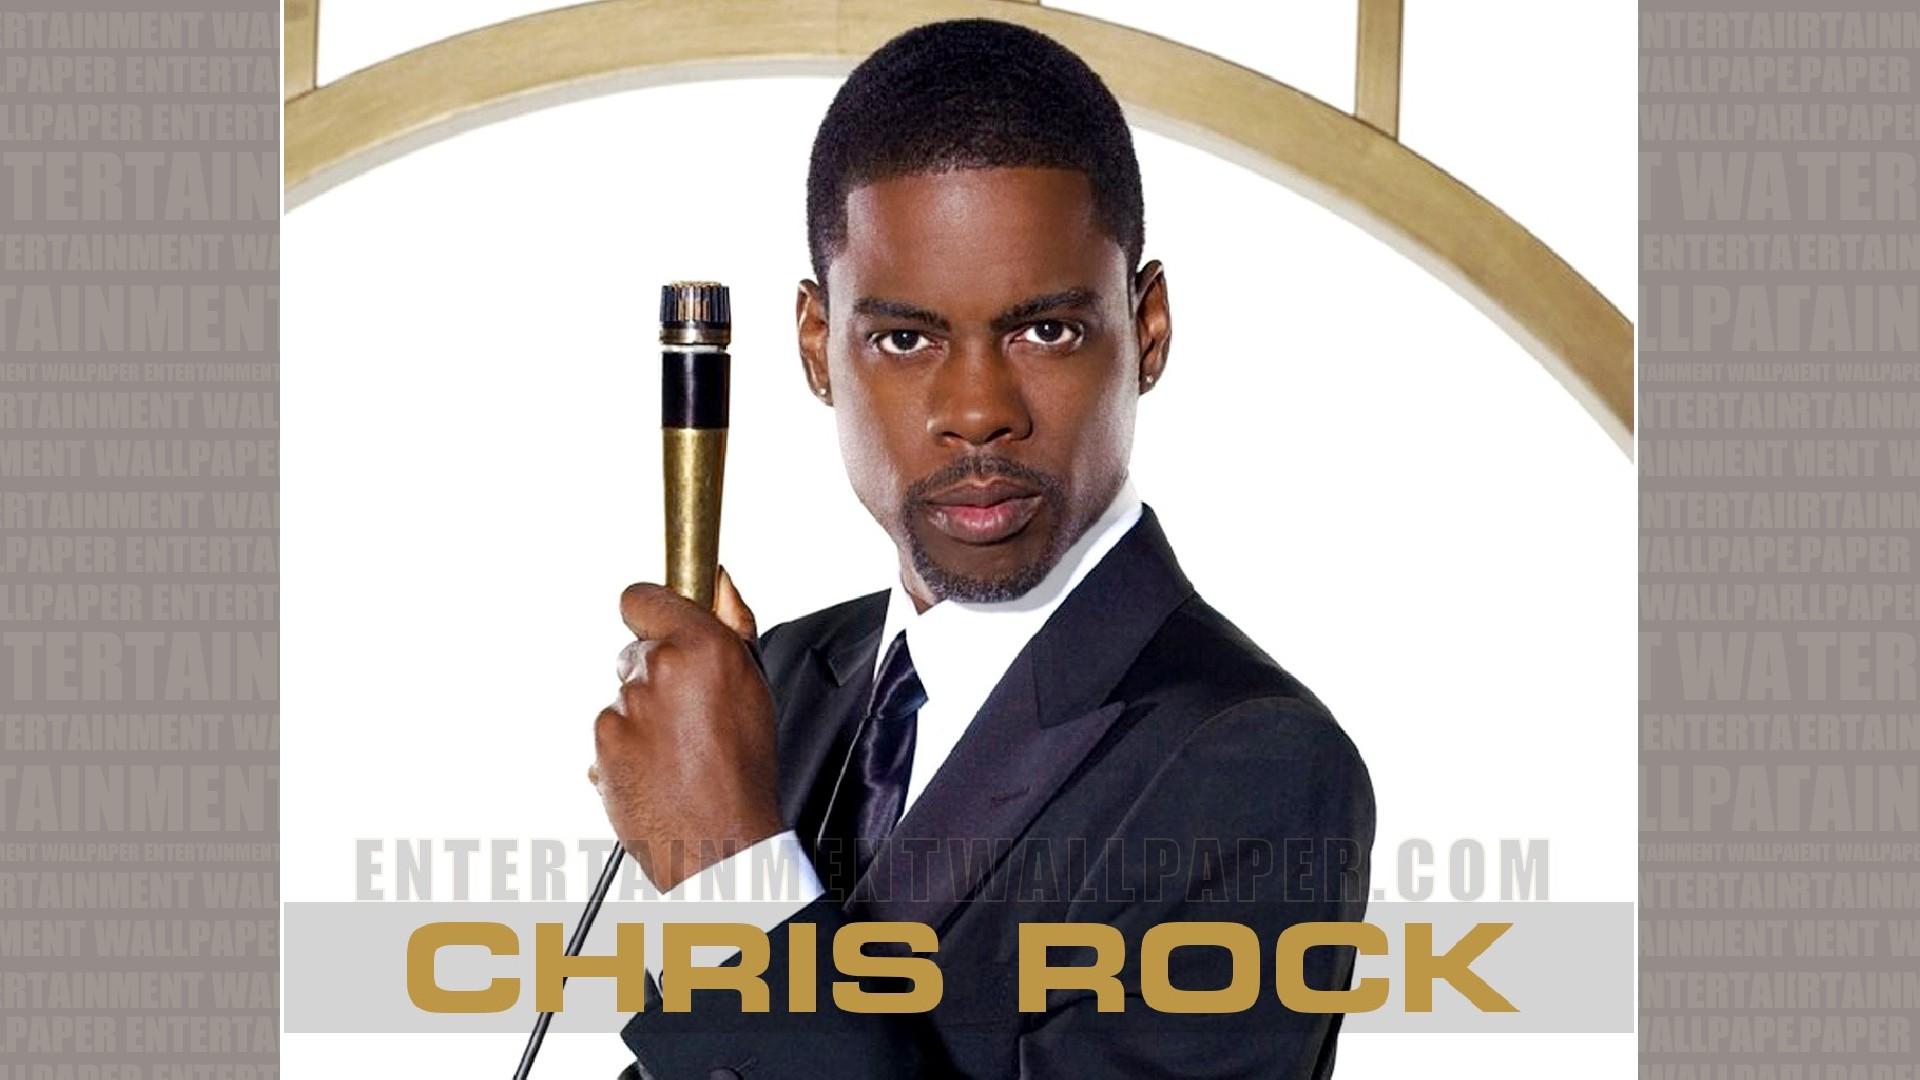 Chris Rock Wallpaper   30031885 1920x1080 Desktop Download 1920x1080